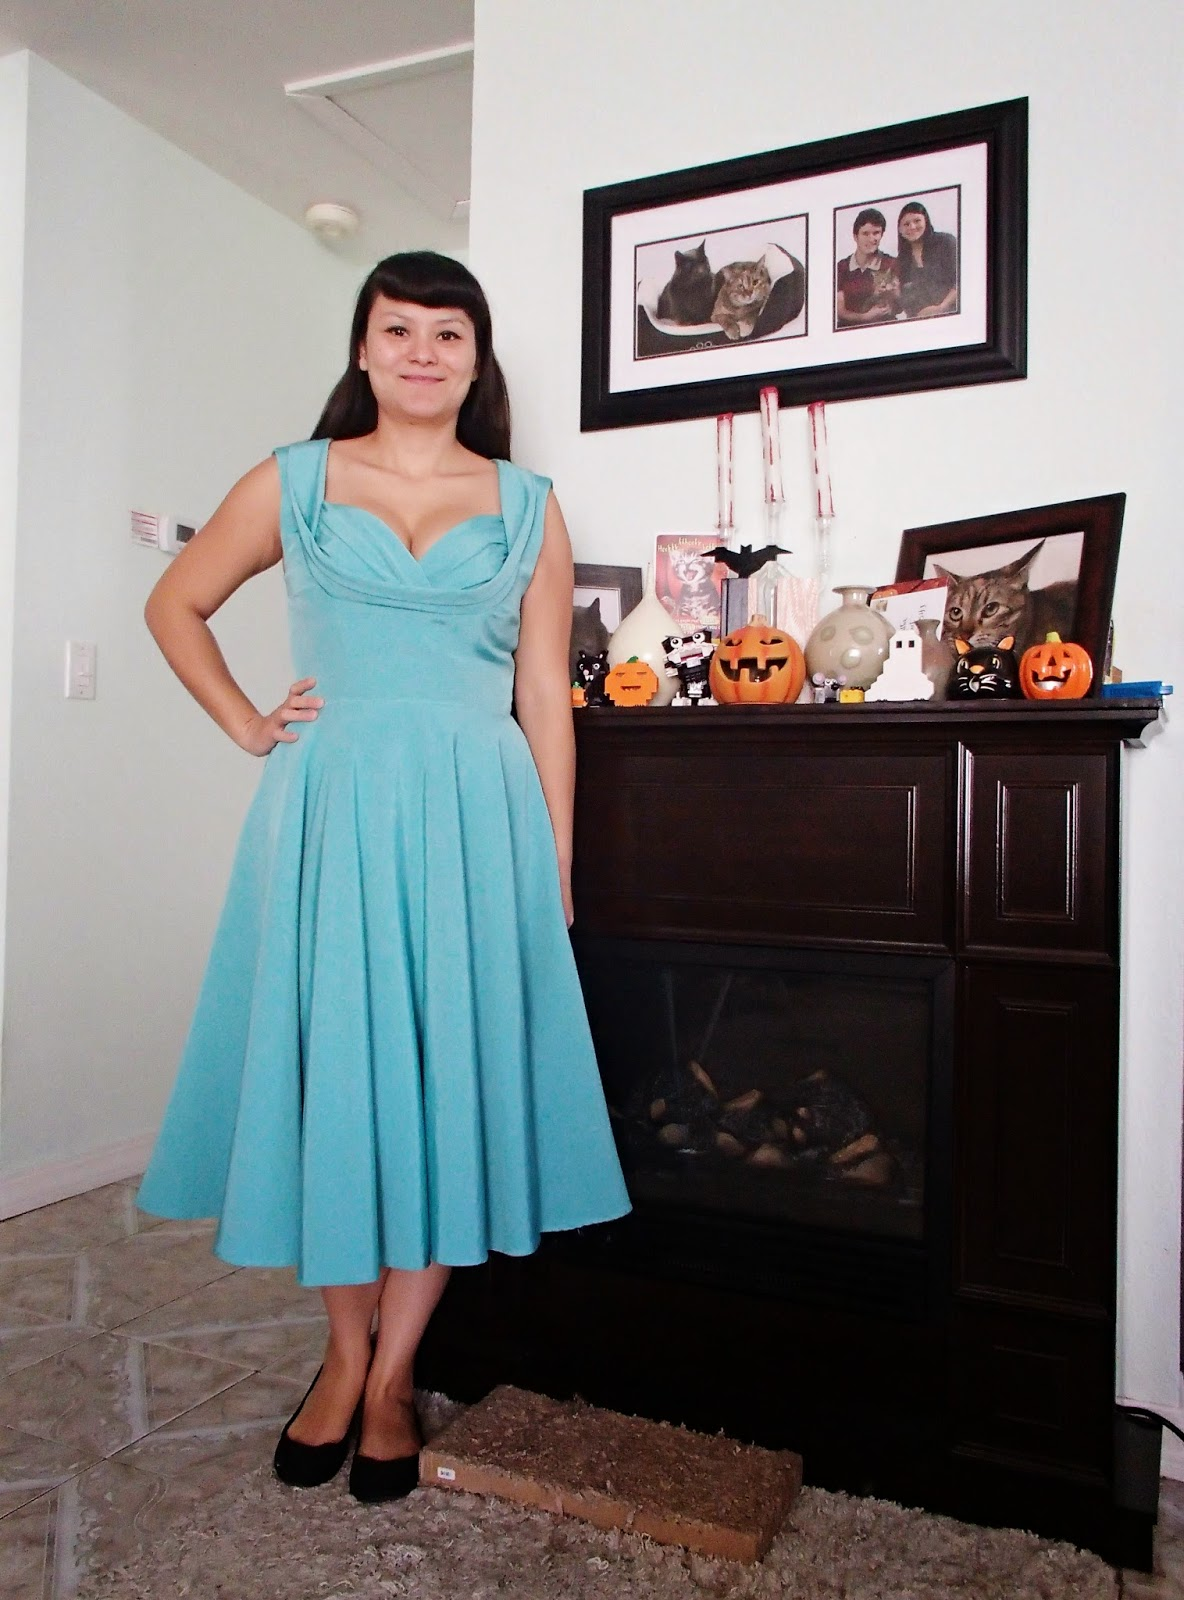 Silver Cat Tea Party: Fancy Dress For Less